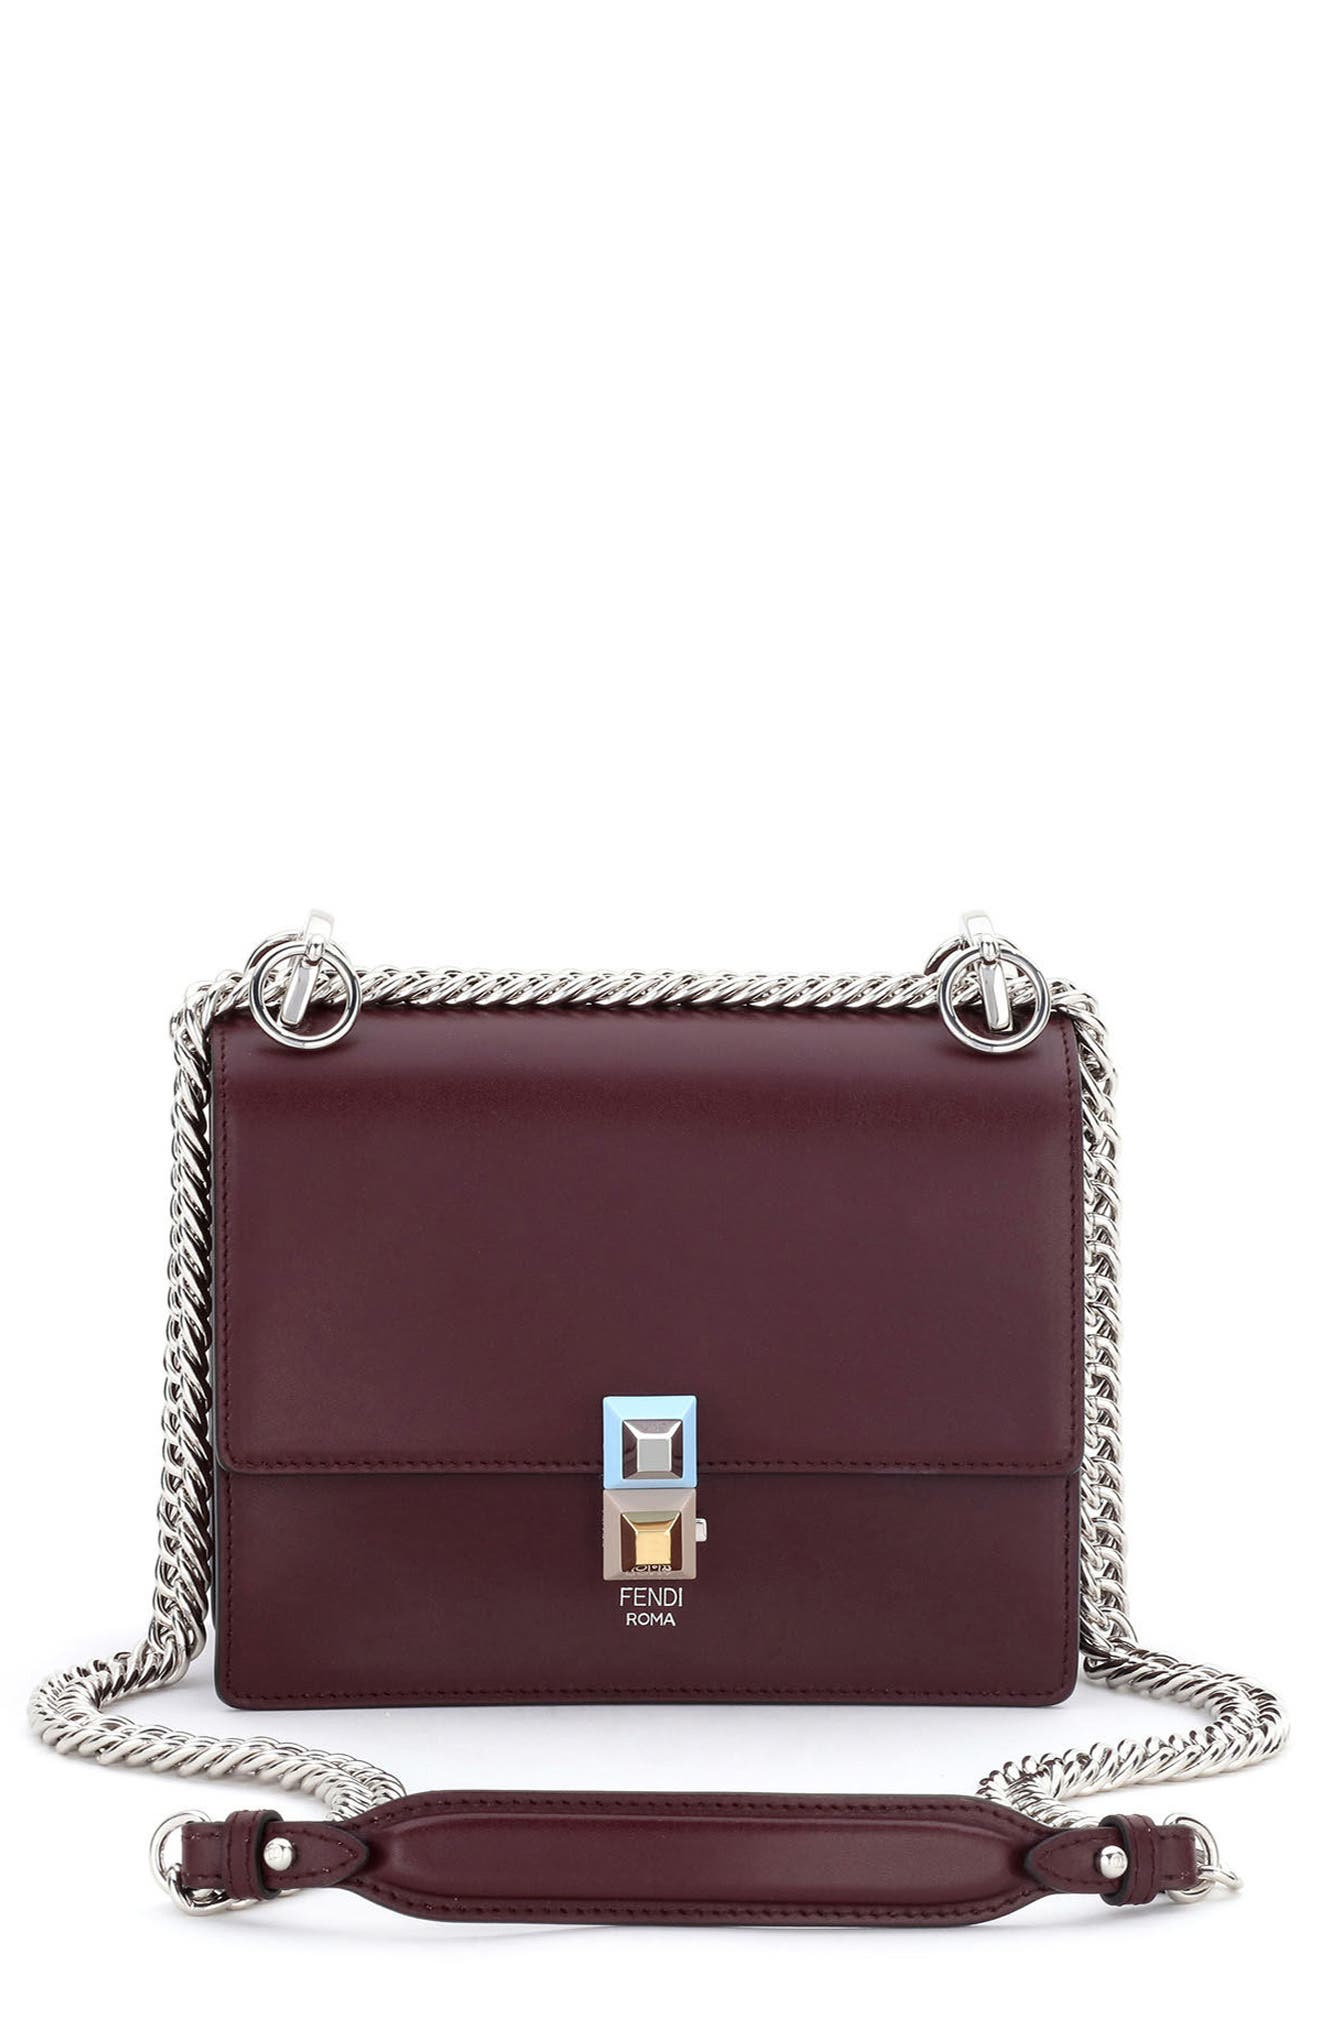 Alternate Image 1 Selected - Fendi Small Kan I Leather Bag